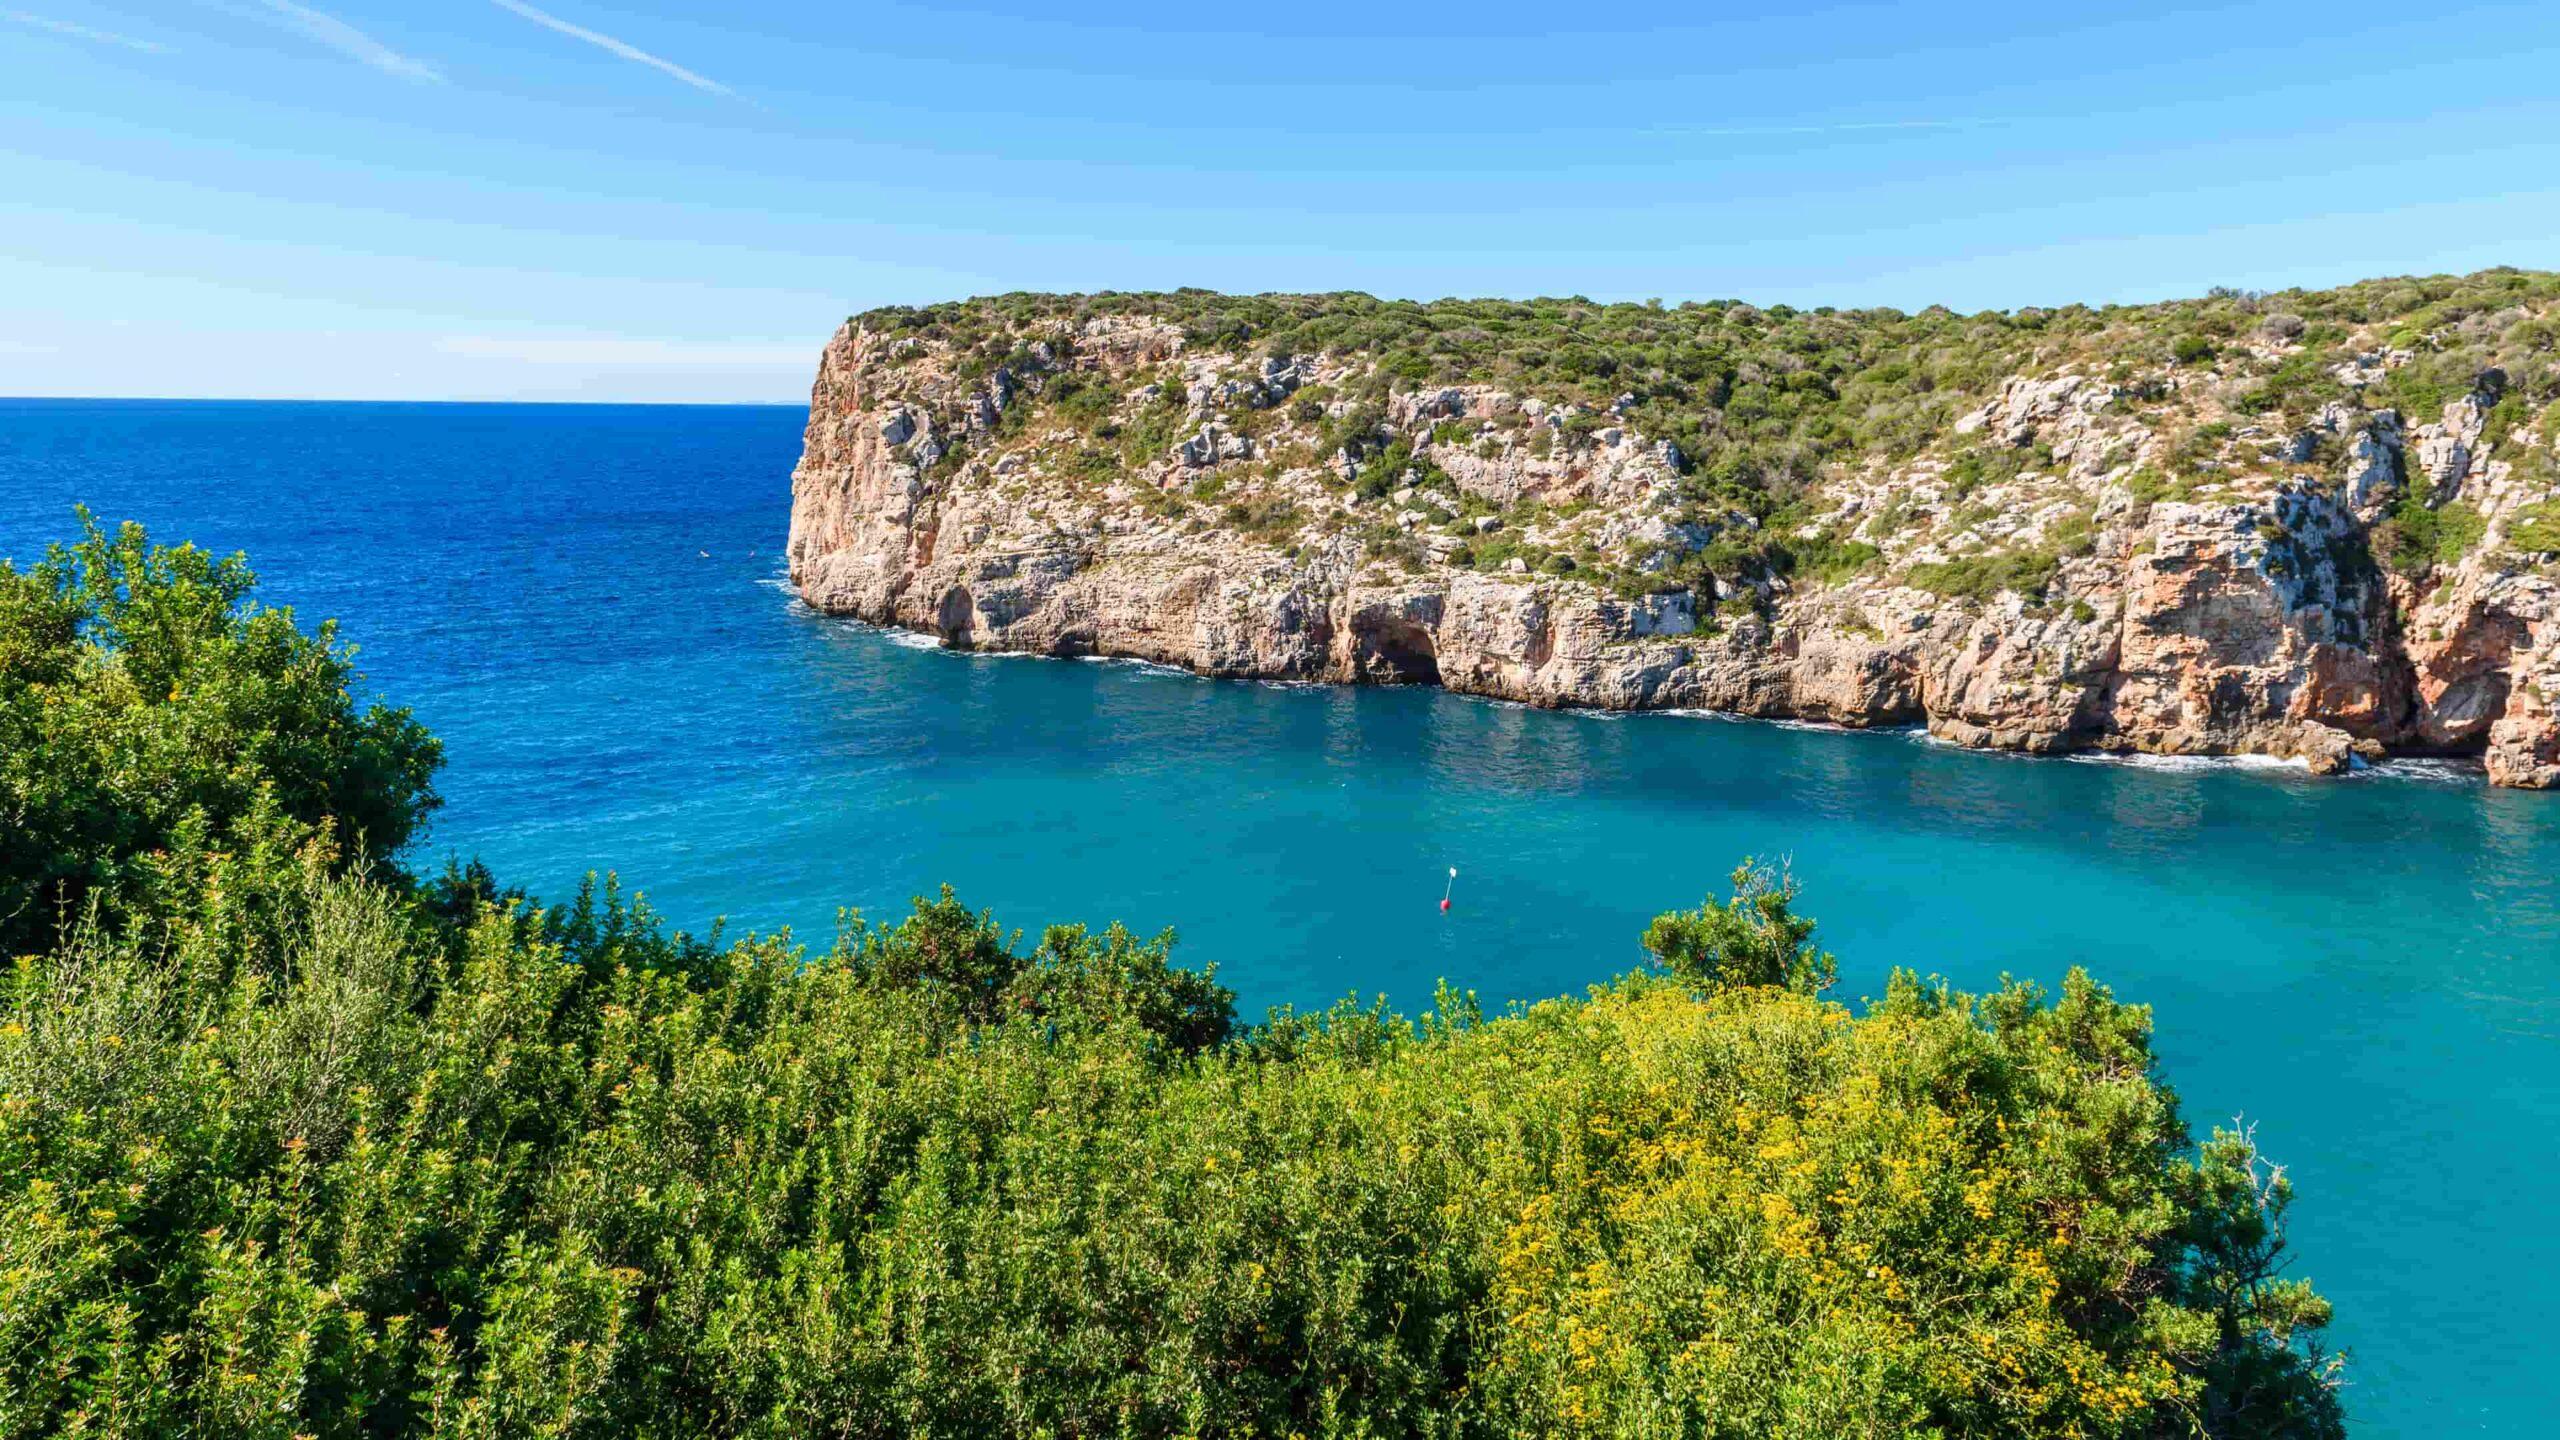 Menorca Cala 'n Porter